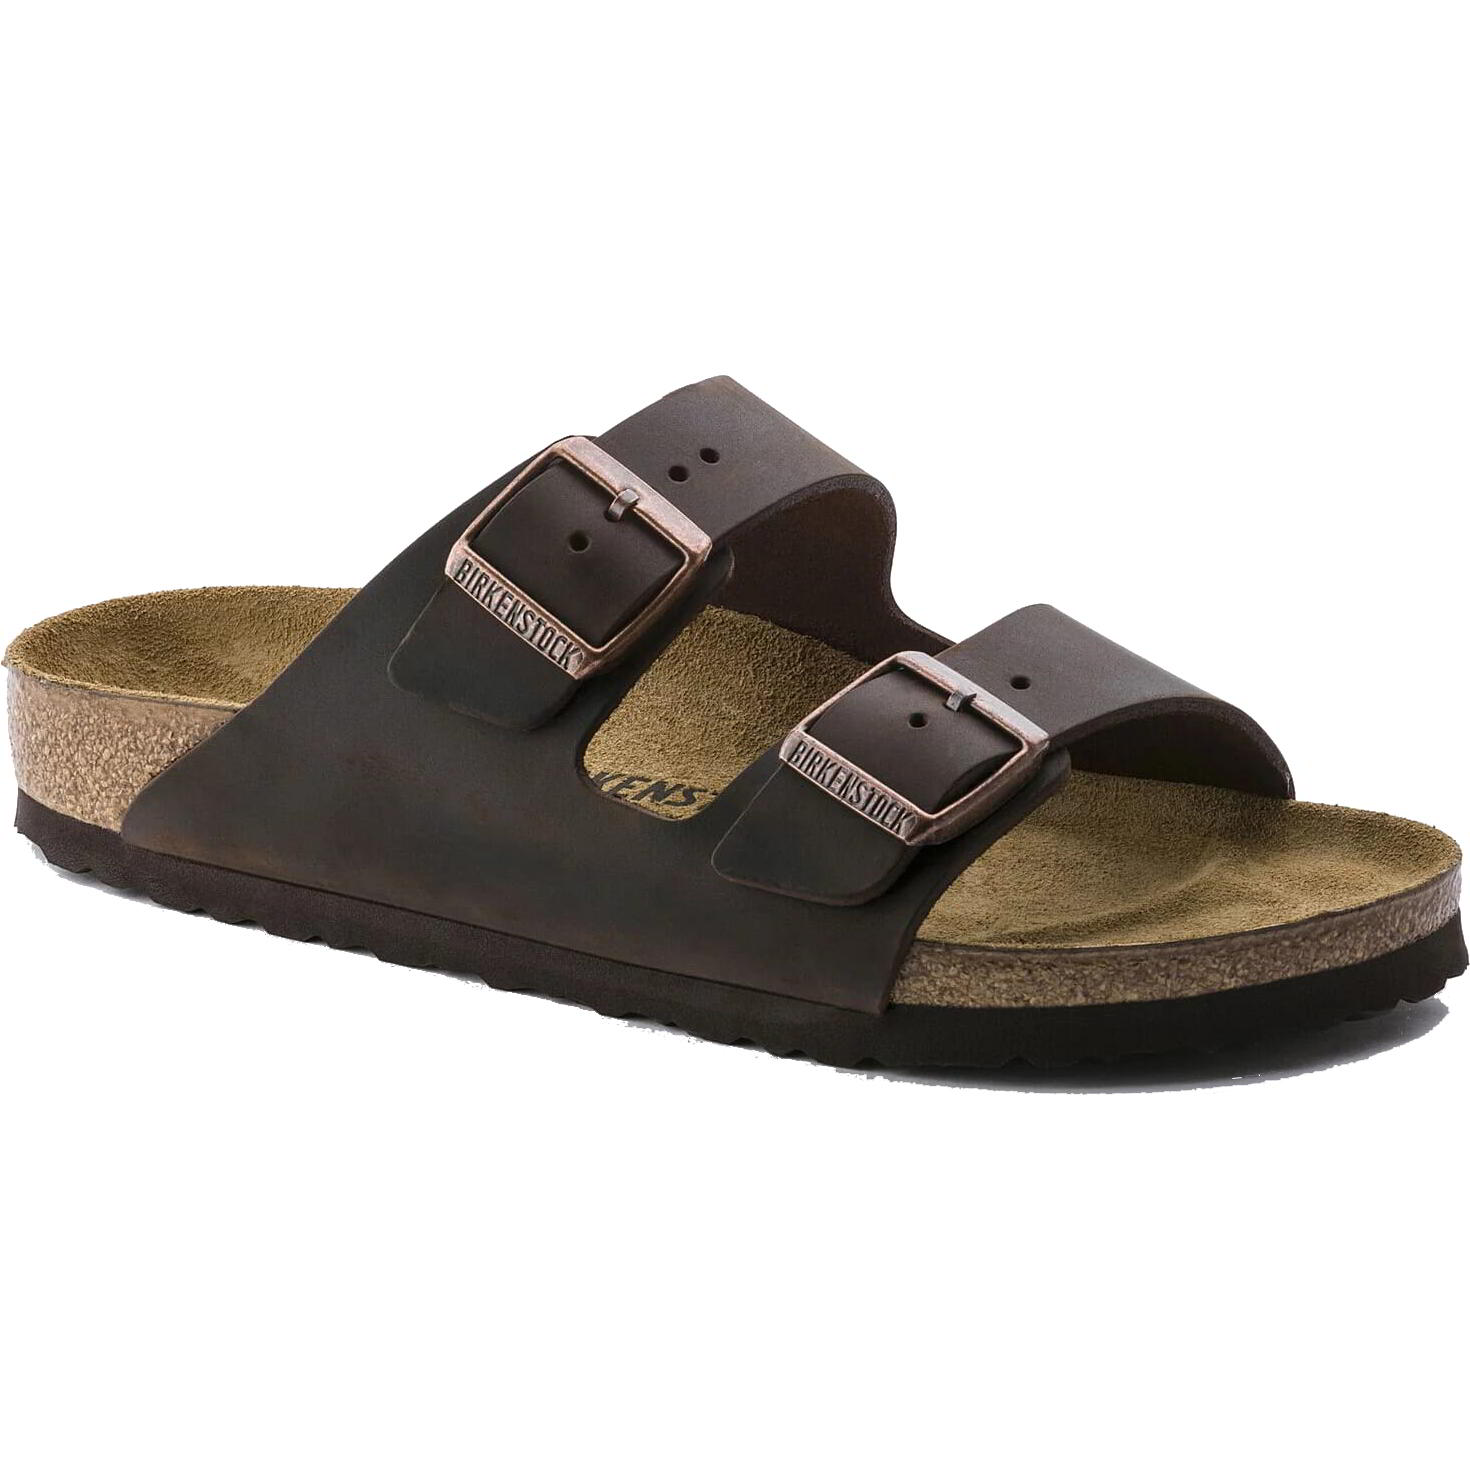 Birkenstock Mens Arizona Leather Sandals - Dark Brown